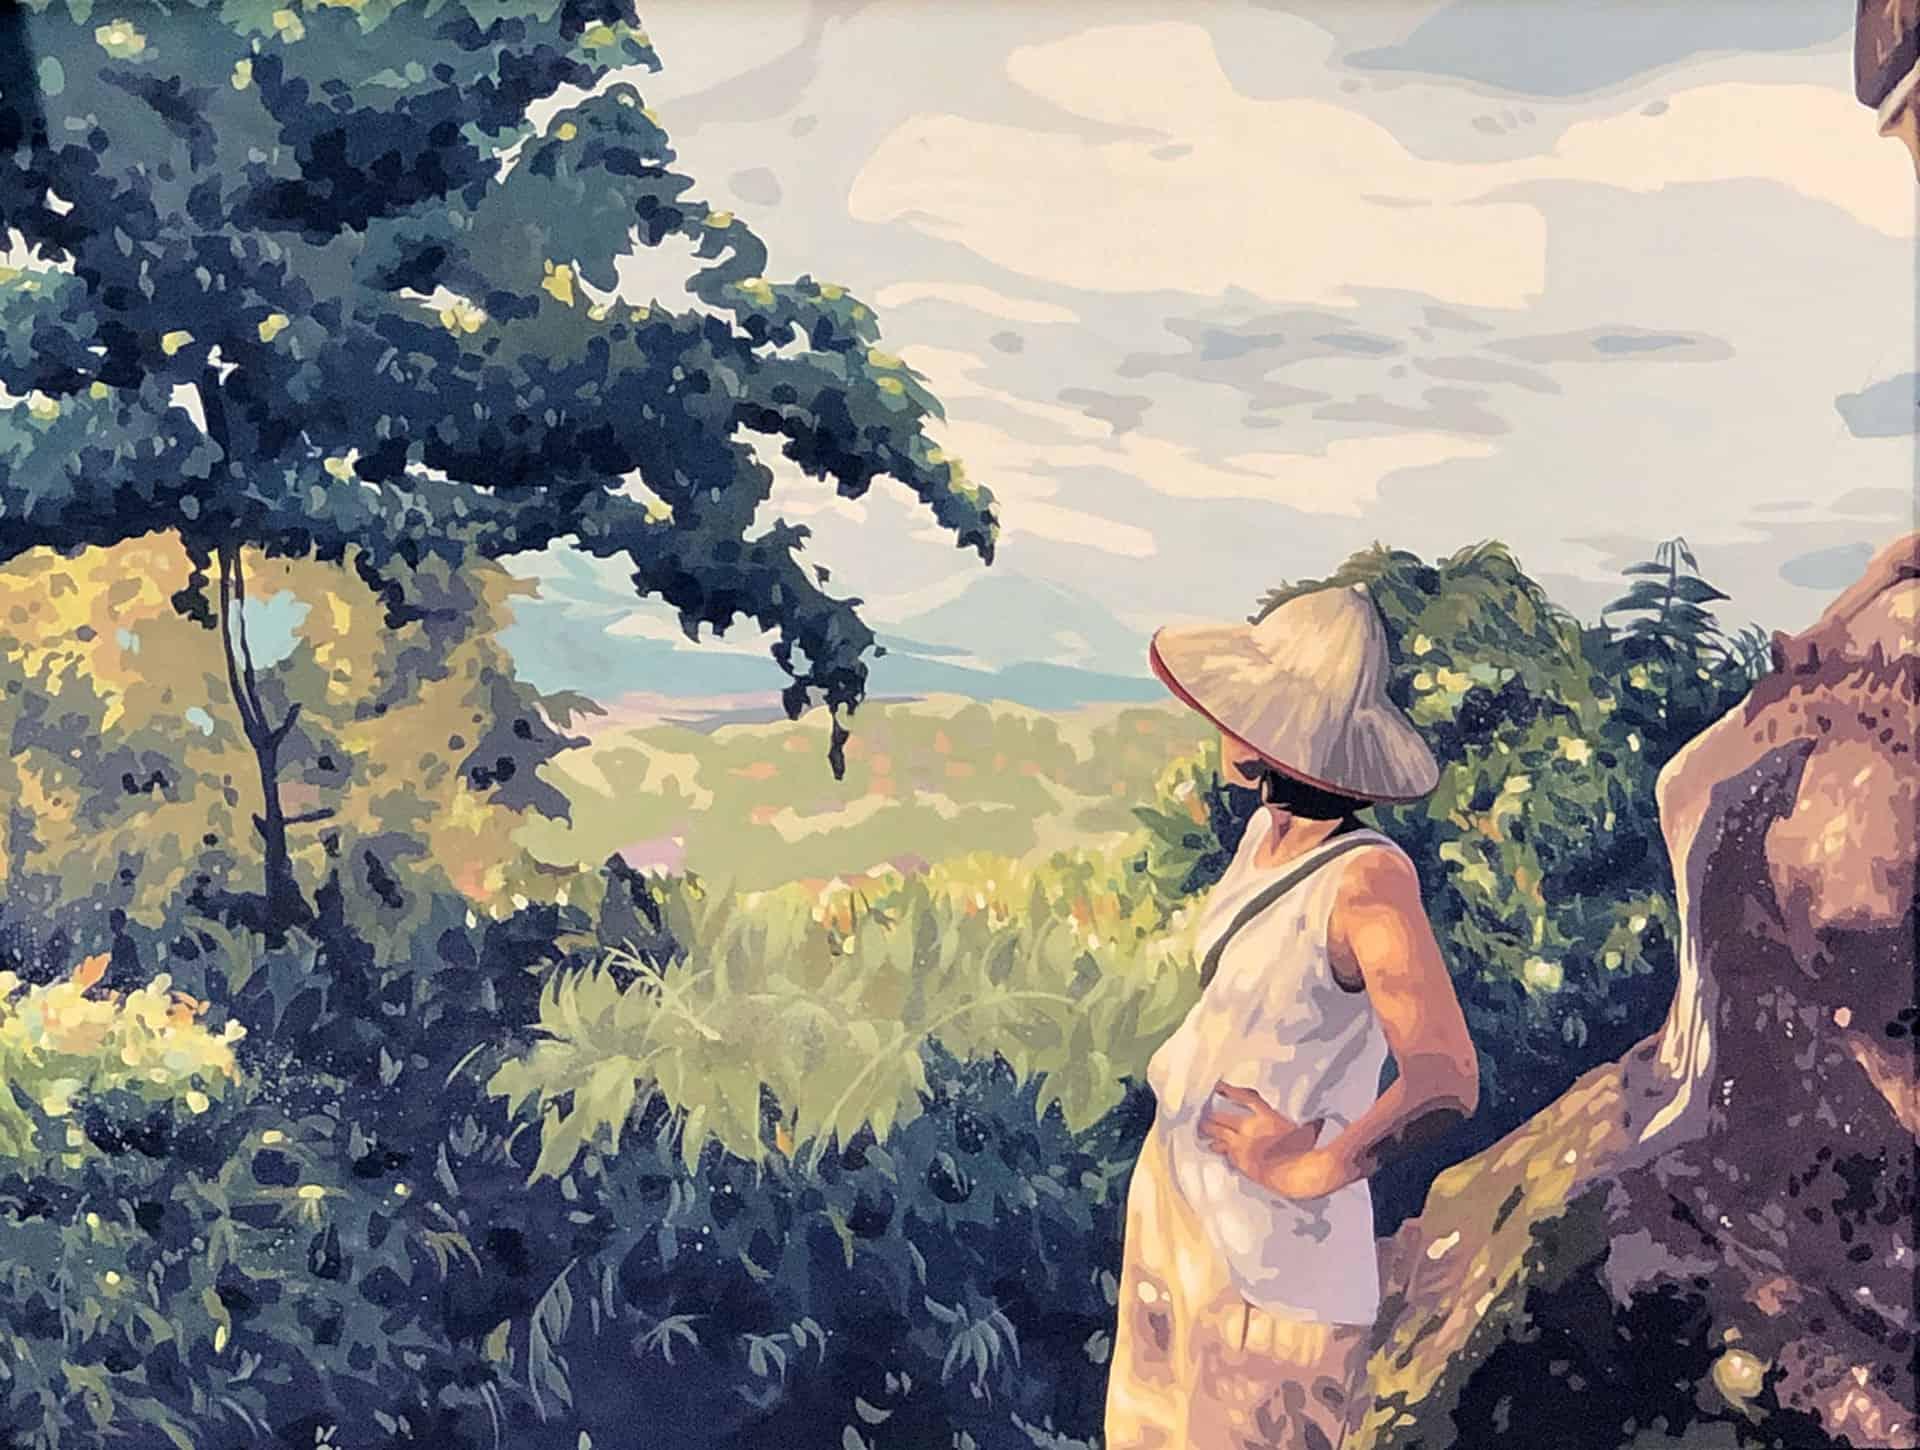 """Atmospheric Perspective"" by Bewrin Yoou"